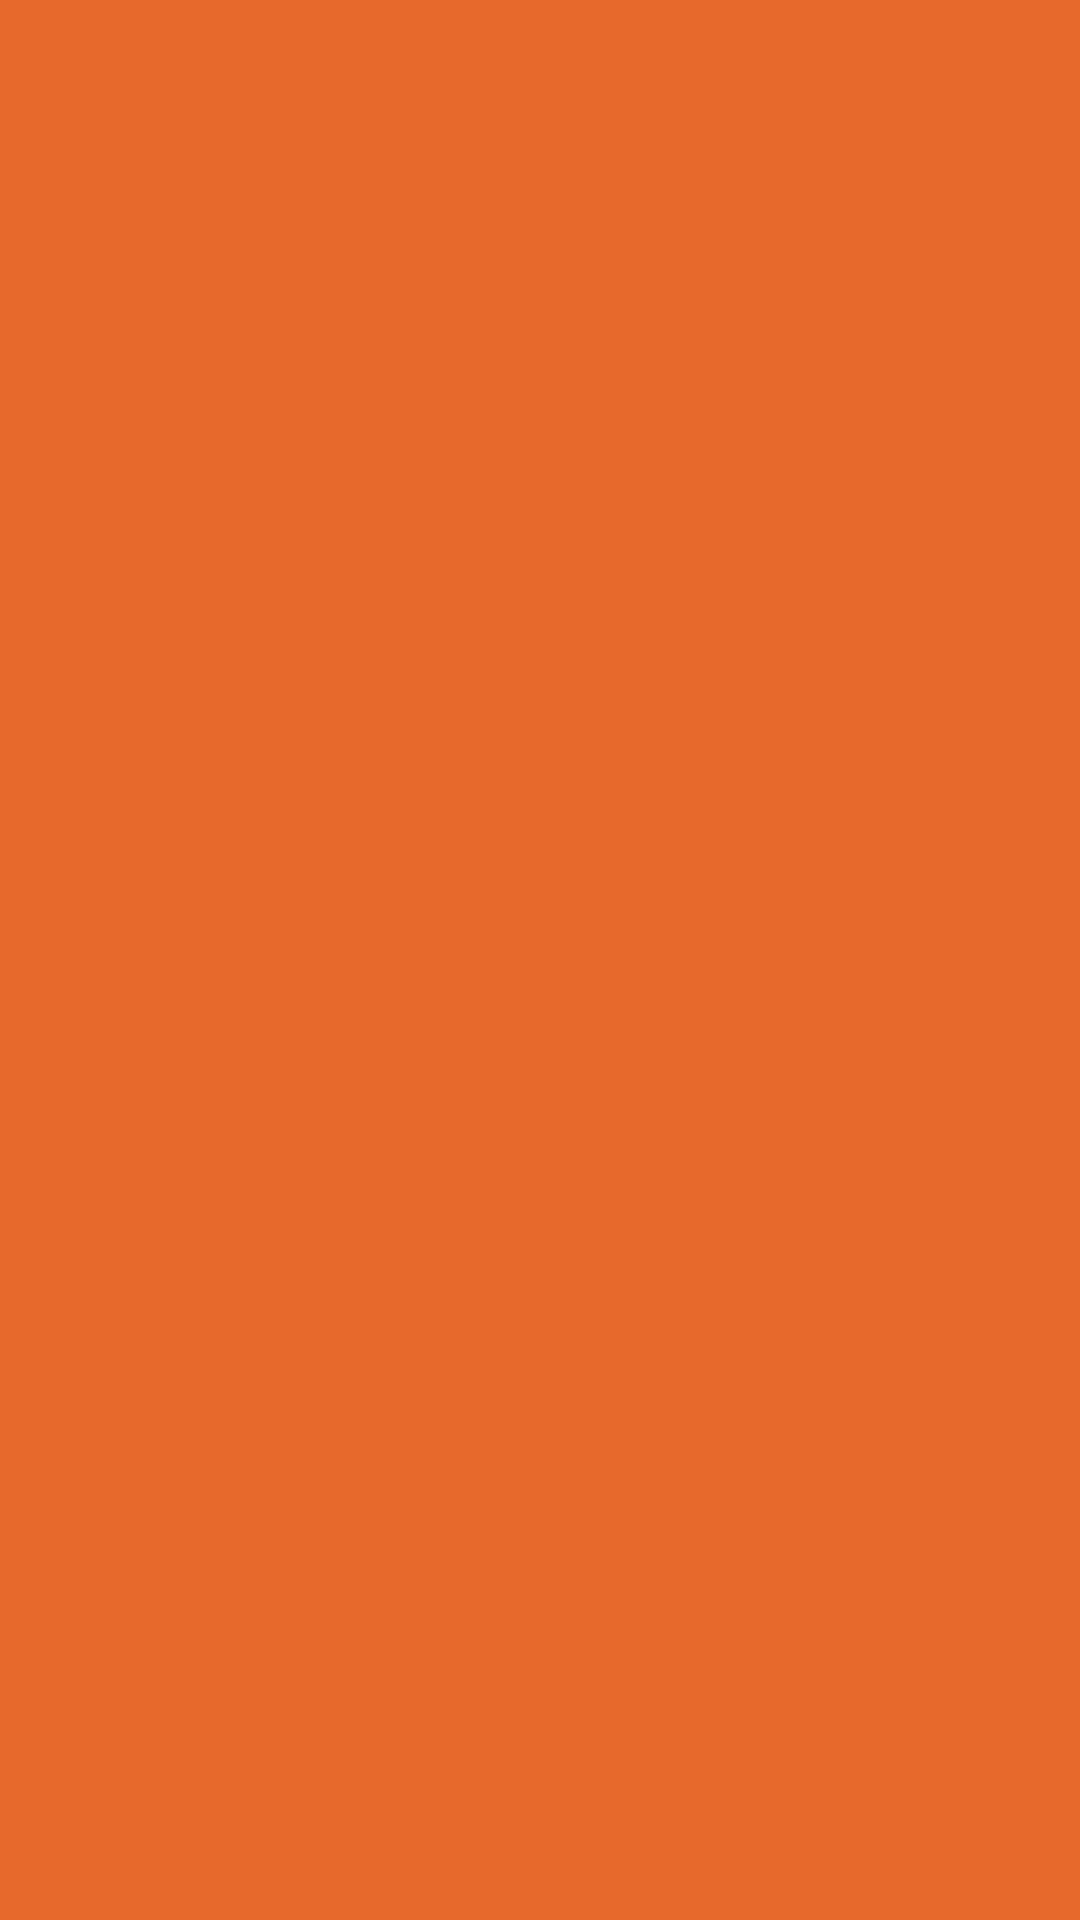 1080x1920 Deep Carrot Orange Solid Color Background